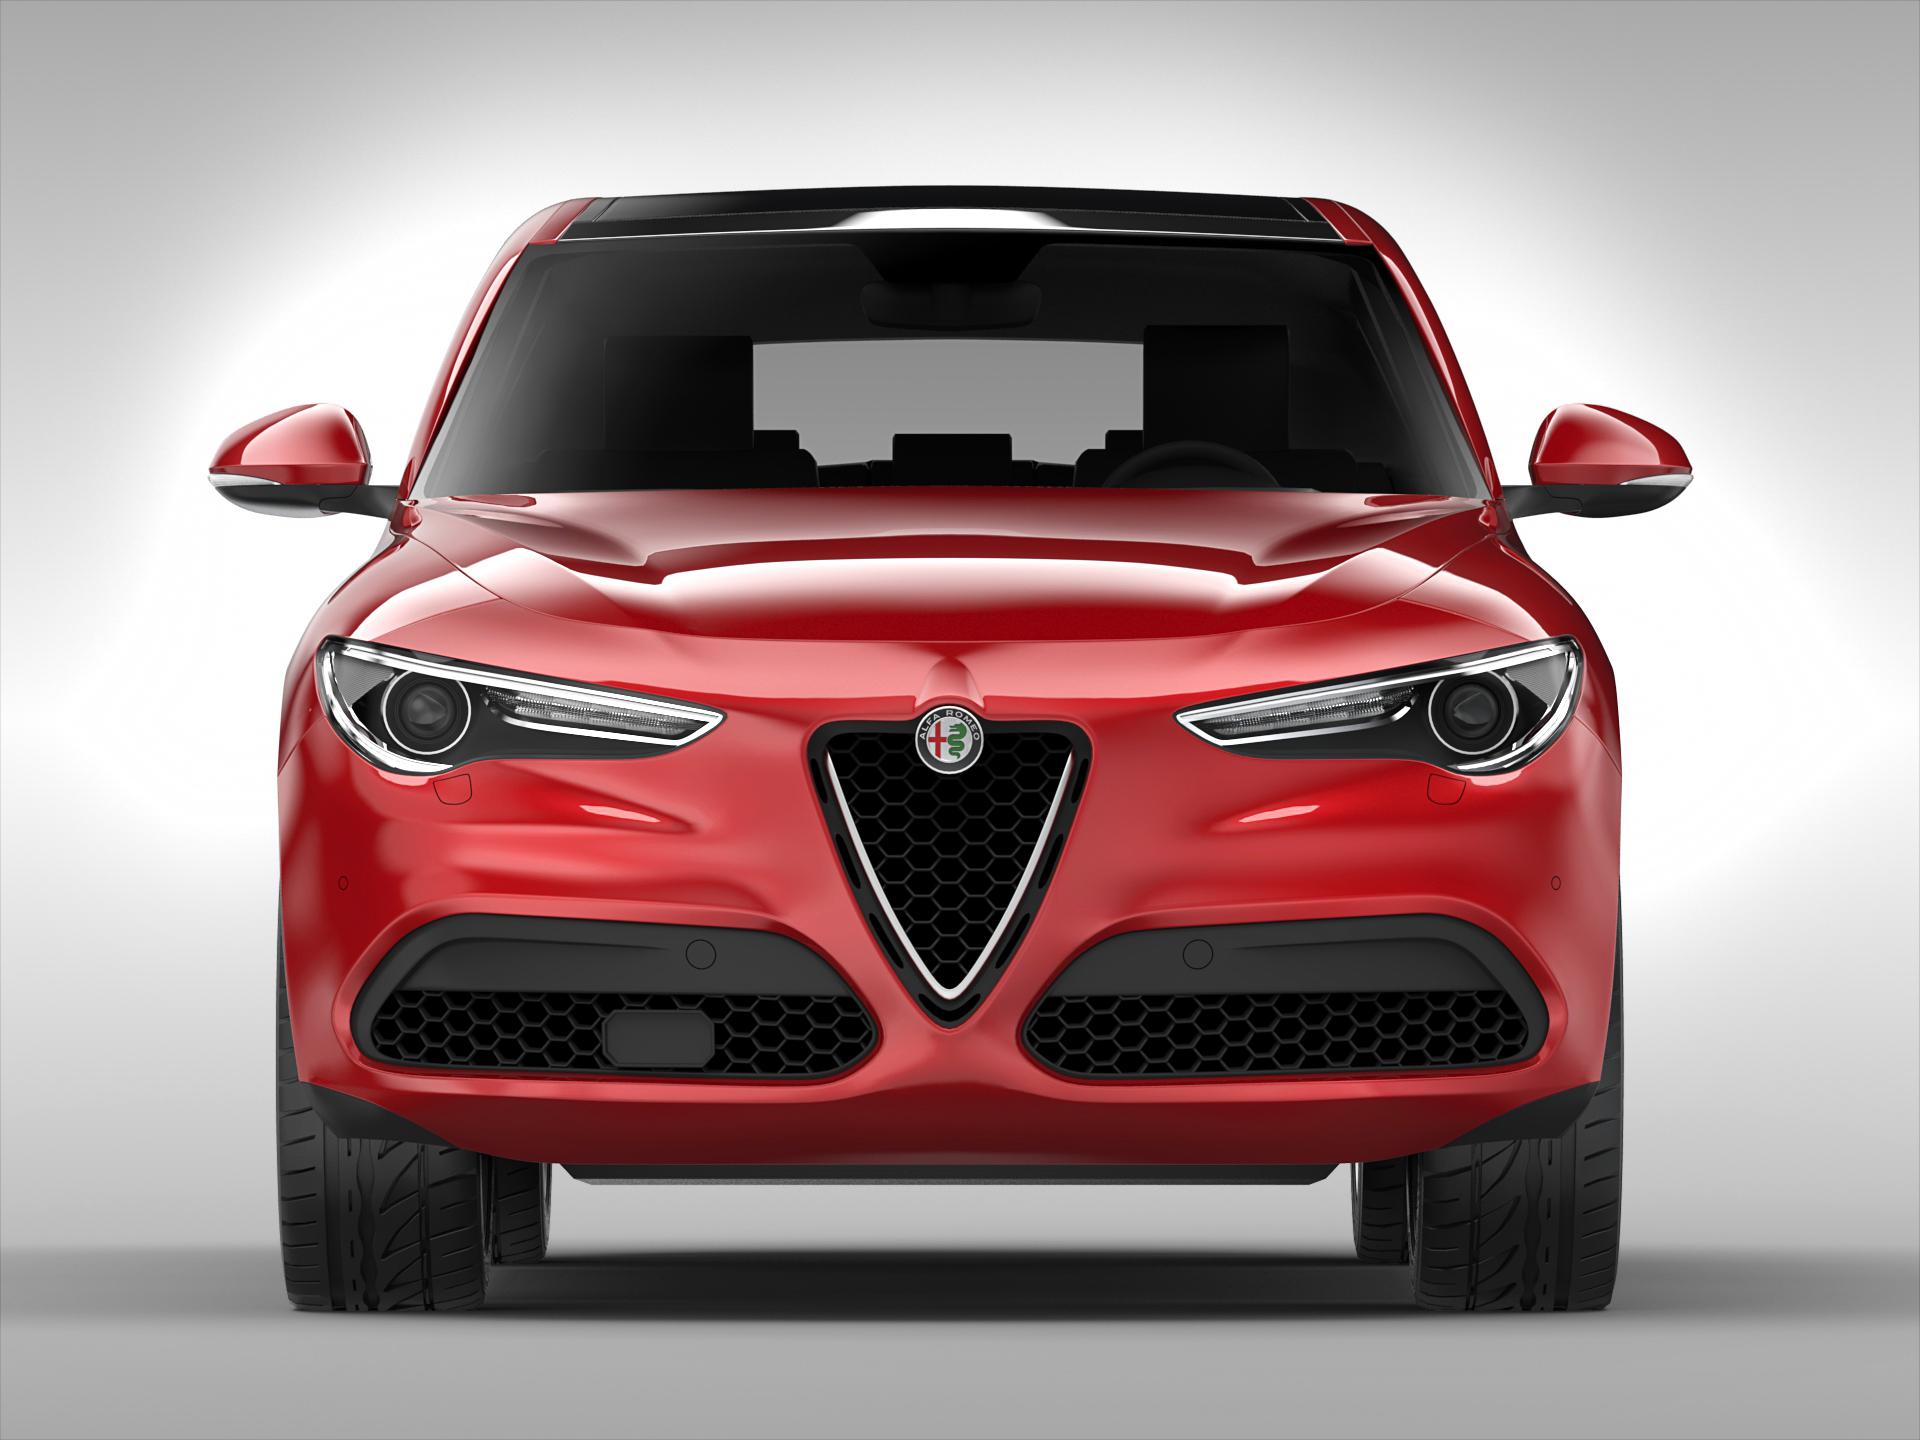 Alfa Romeo Stelvio D Model FlatPyramid - Alfa romeo model